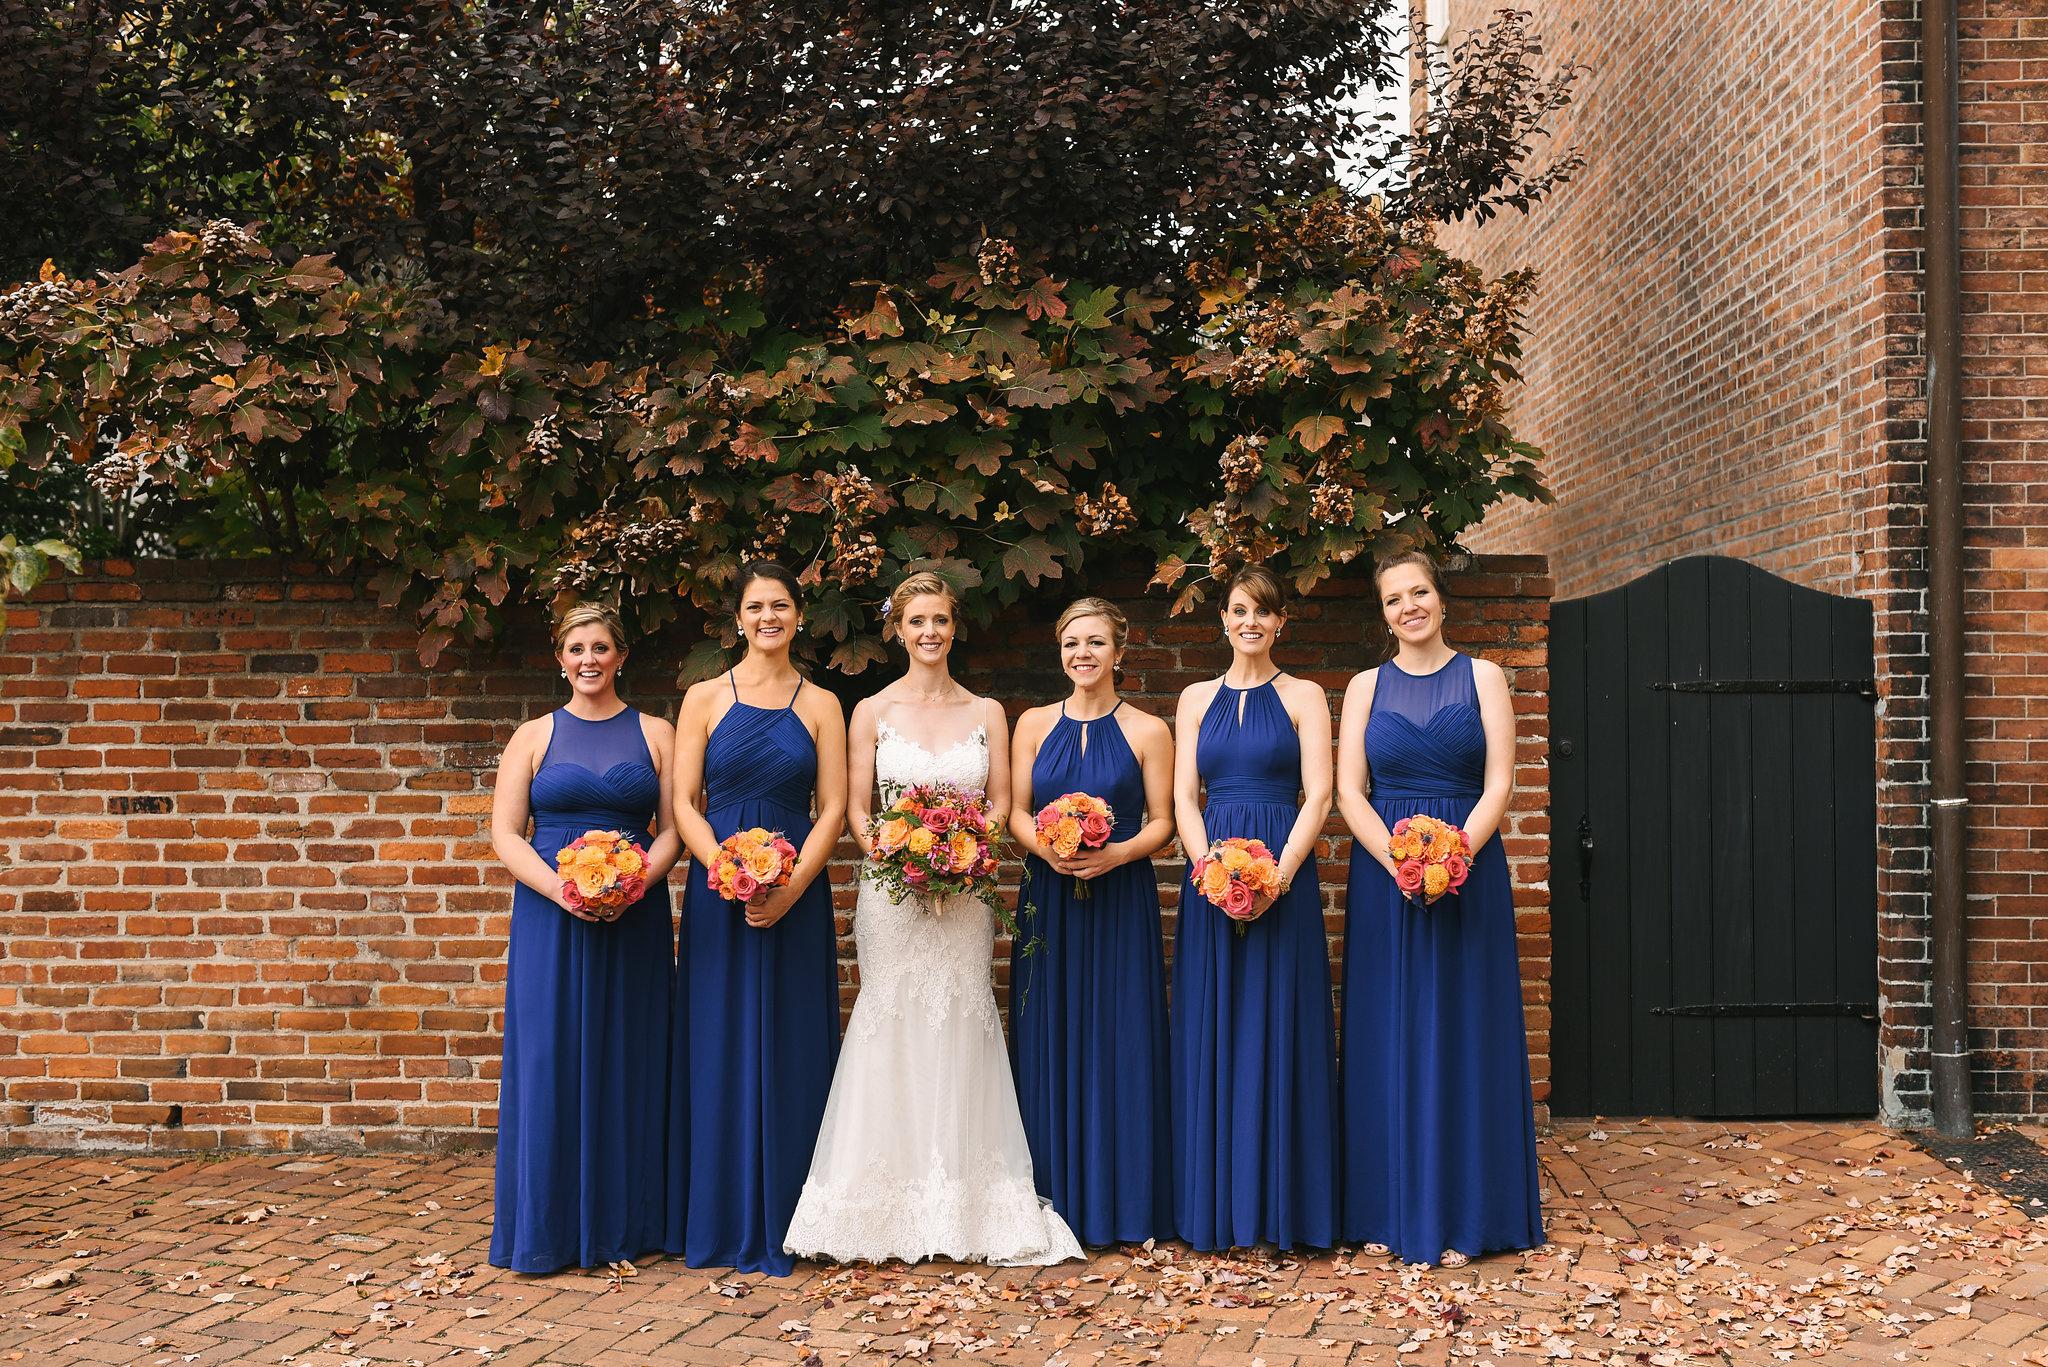 Alexandria, Virginia, Fall Wedding, Historic Wedding, Old Town, DC, Lian Carlo Wedding Dress, Lace Wedding Dress, The Enchanted Florist Bouquet, Bride and Bridesmaids, Blue Bridesmaid Dresses